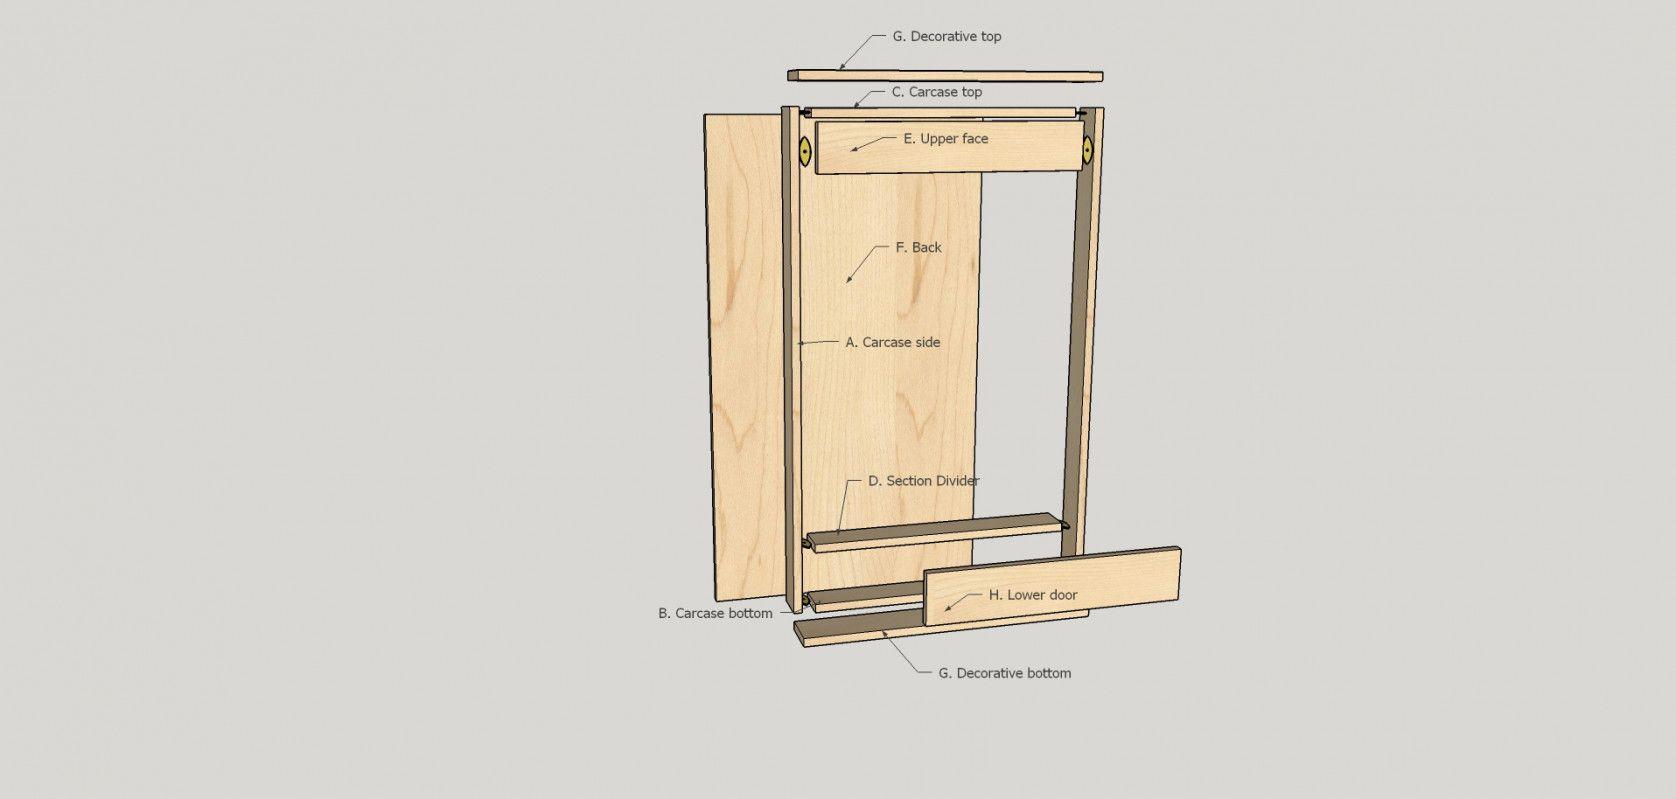 pin by rahayu12 on interior analogi woodworking dart board rh pinterest com Make a Dart Board Cabinet free standing dartboard cabinet plans